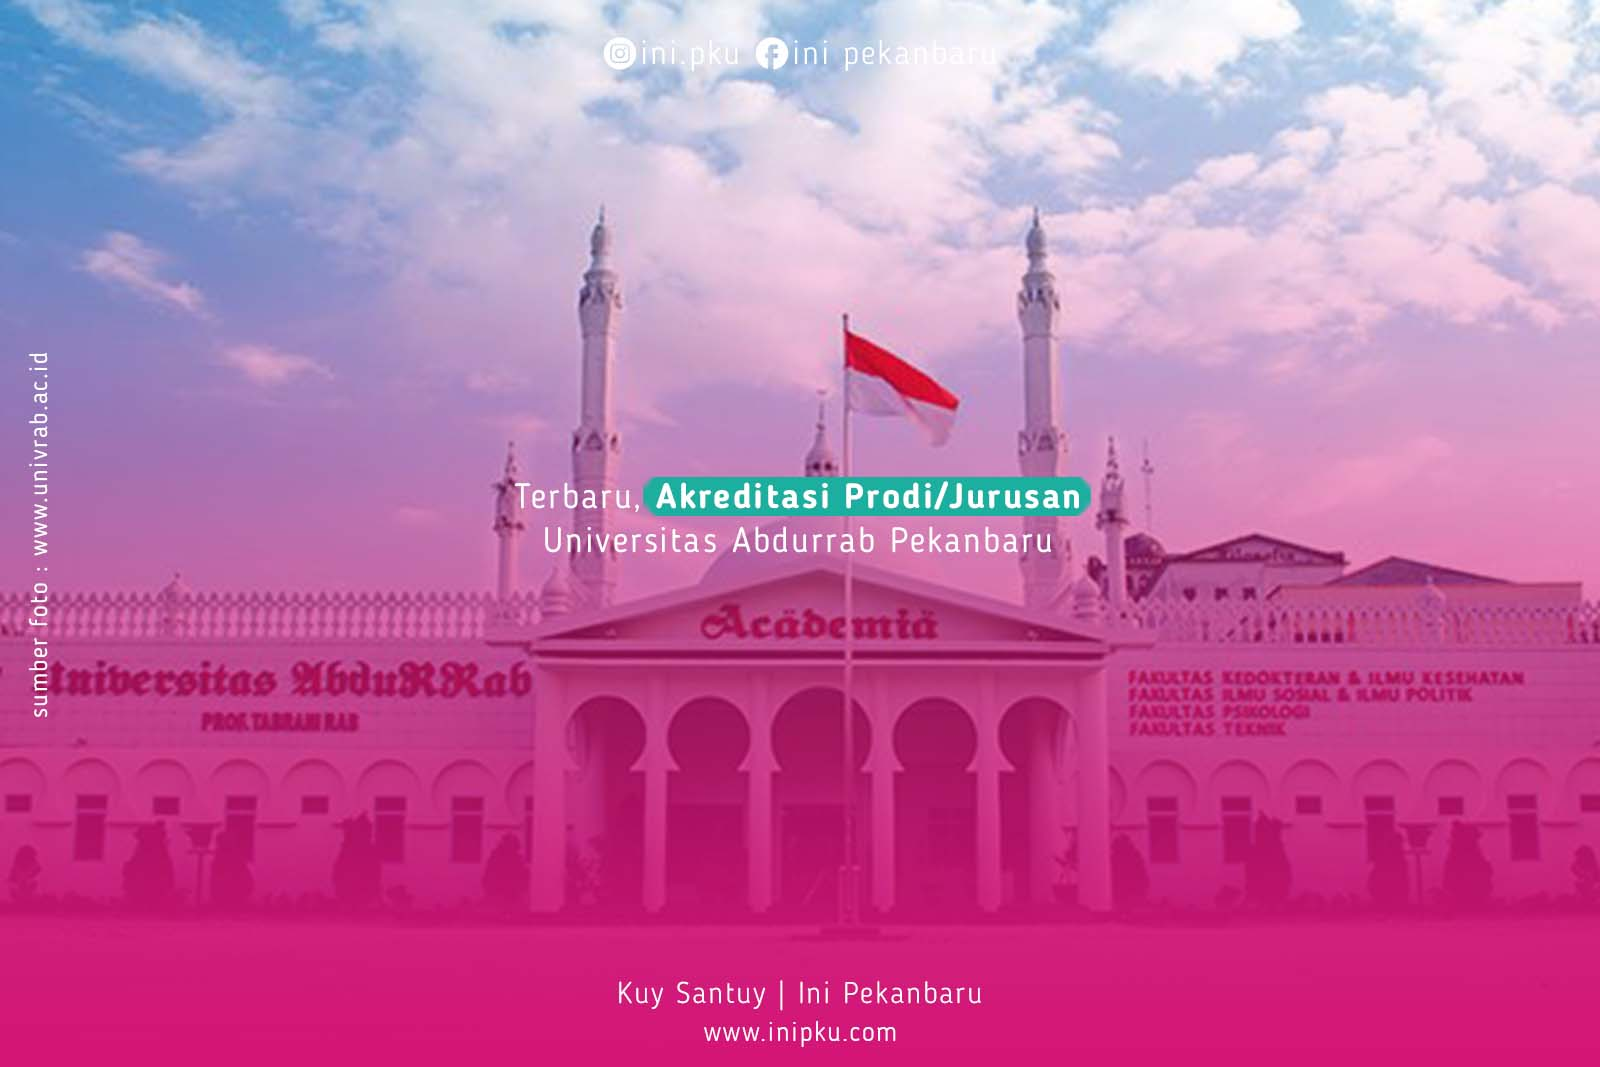 Terbaru, Akreditasi Prodi/Jurusan Universitas Abdurrab Pekanbaru